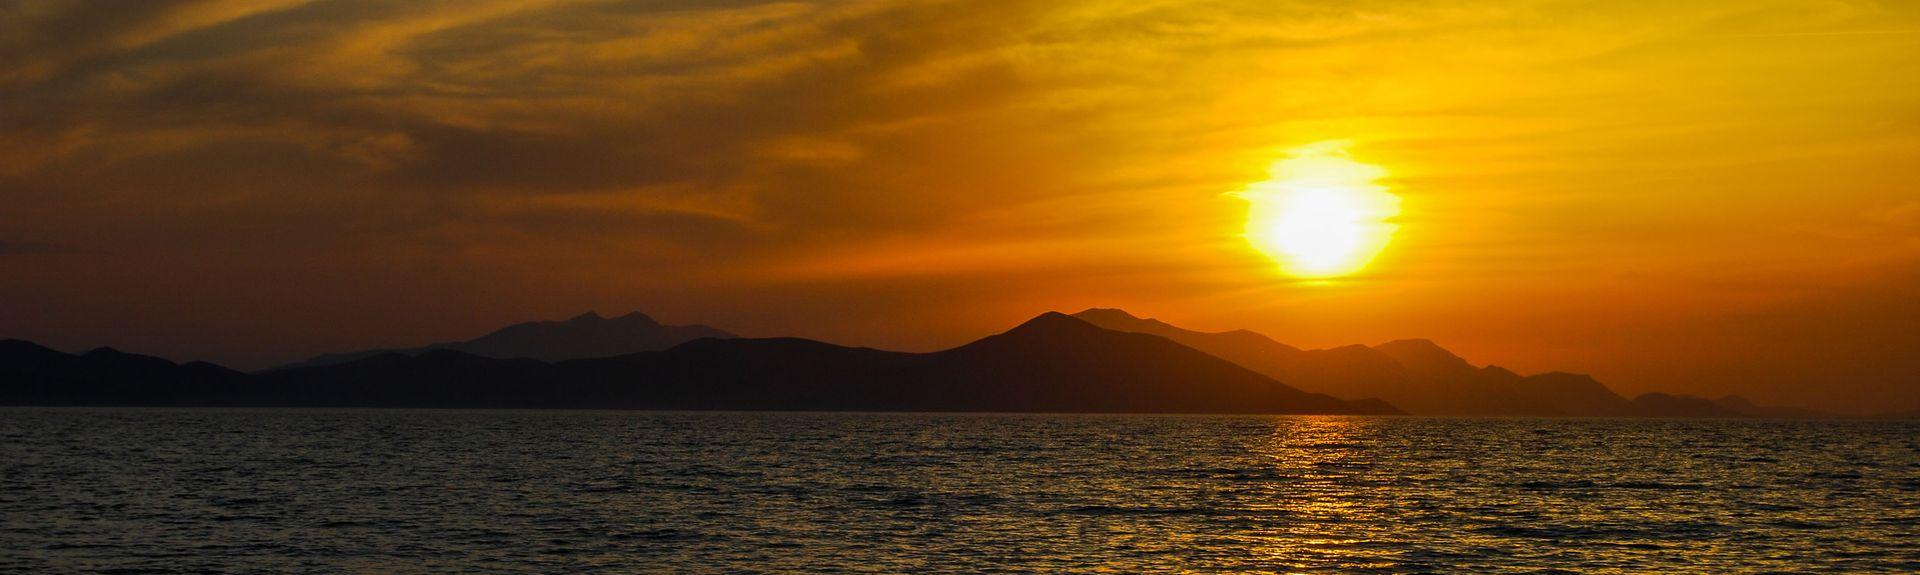 Dikaio, Cos, Ilhas Egeias, Grécia